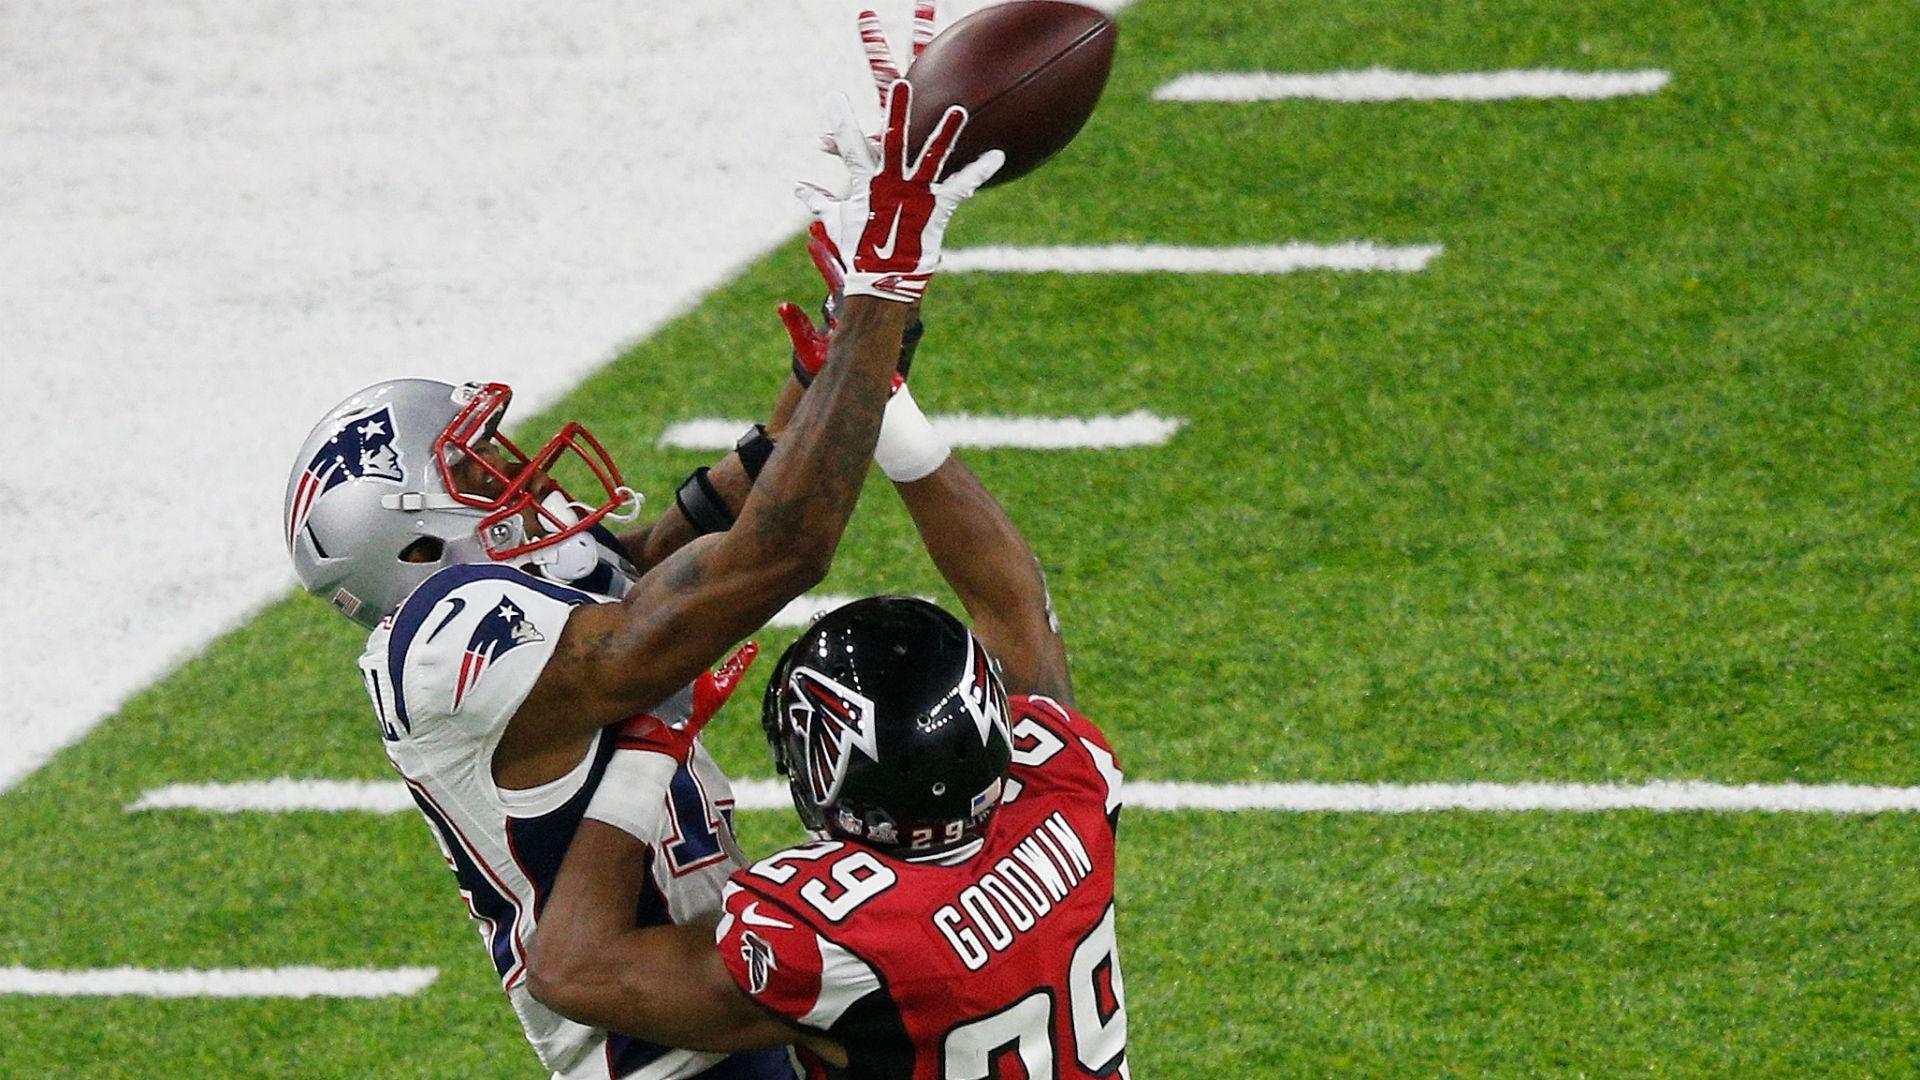 Patriots' unsung hero of Super Bowl 51 retires at just 25